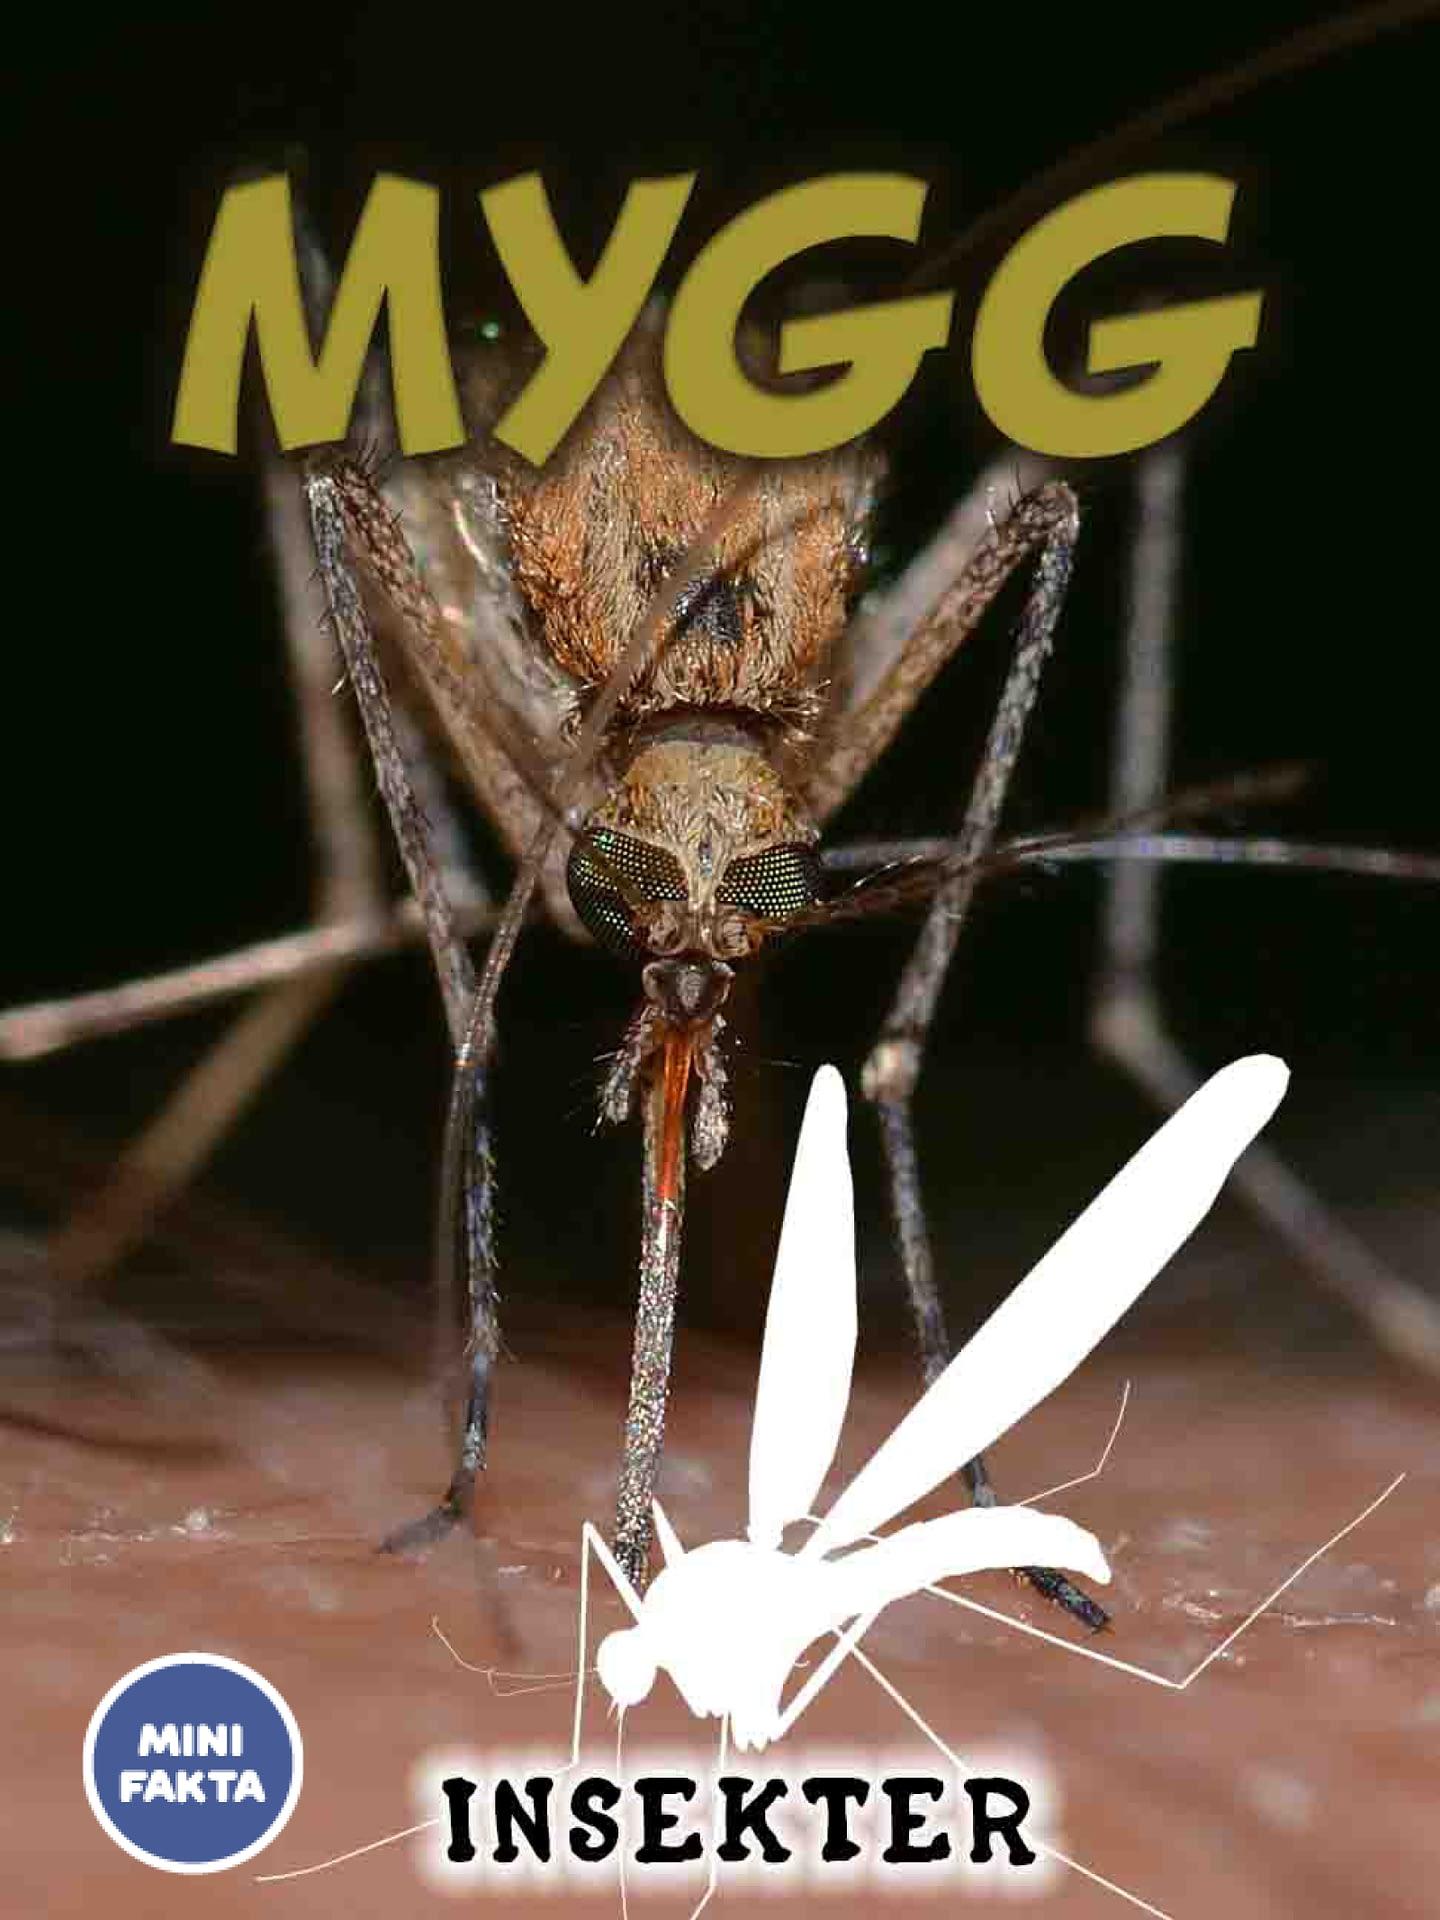 Mygg Minifakta